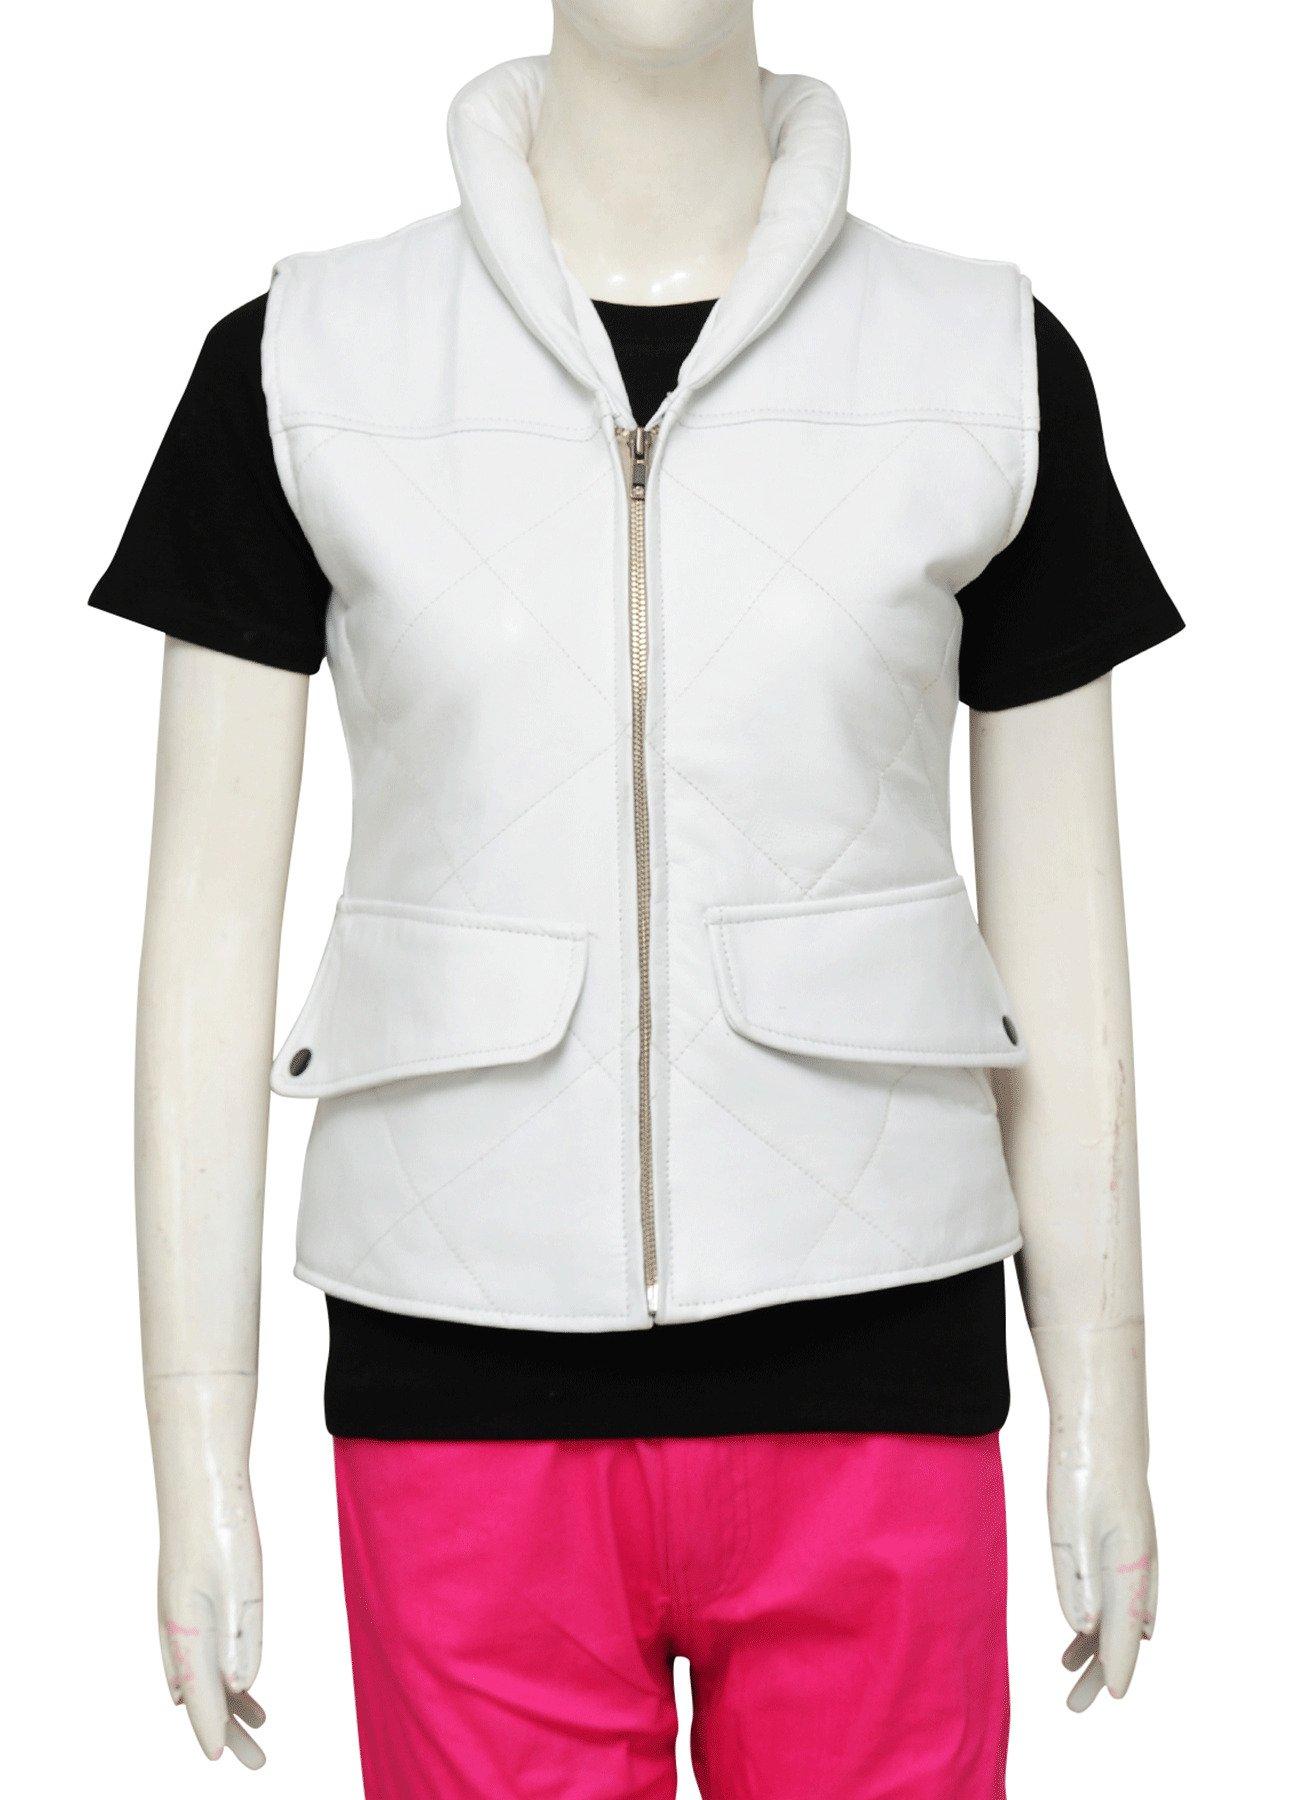 Women Stylish Pearl White Faux Leather Vest